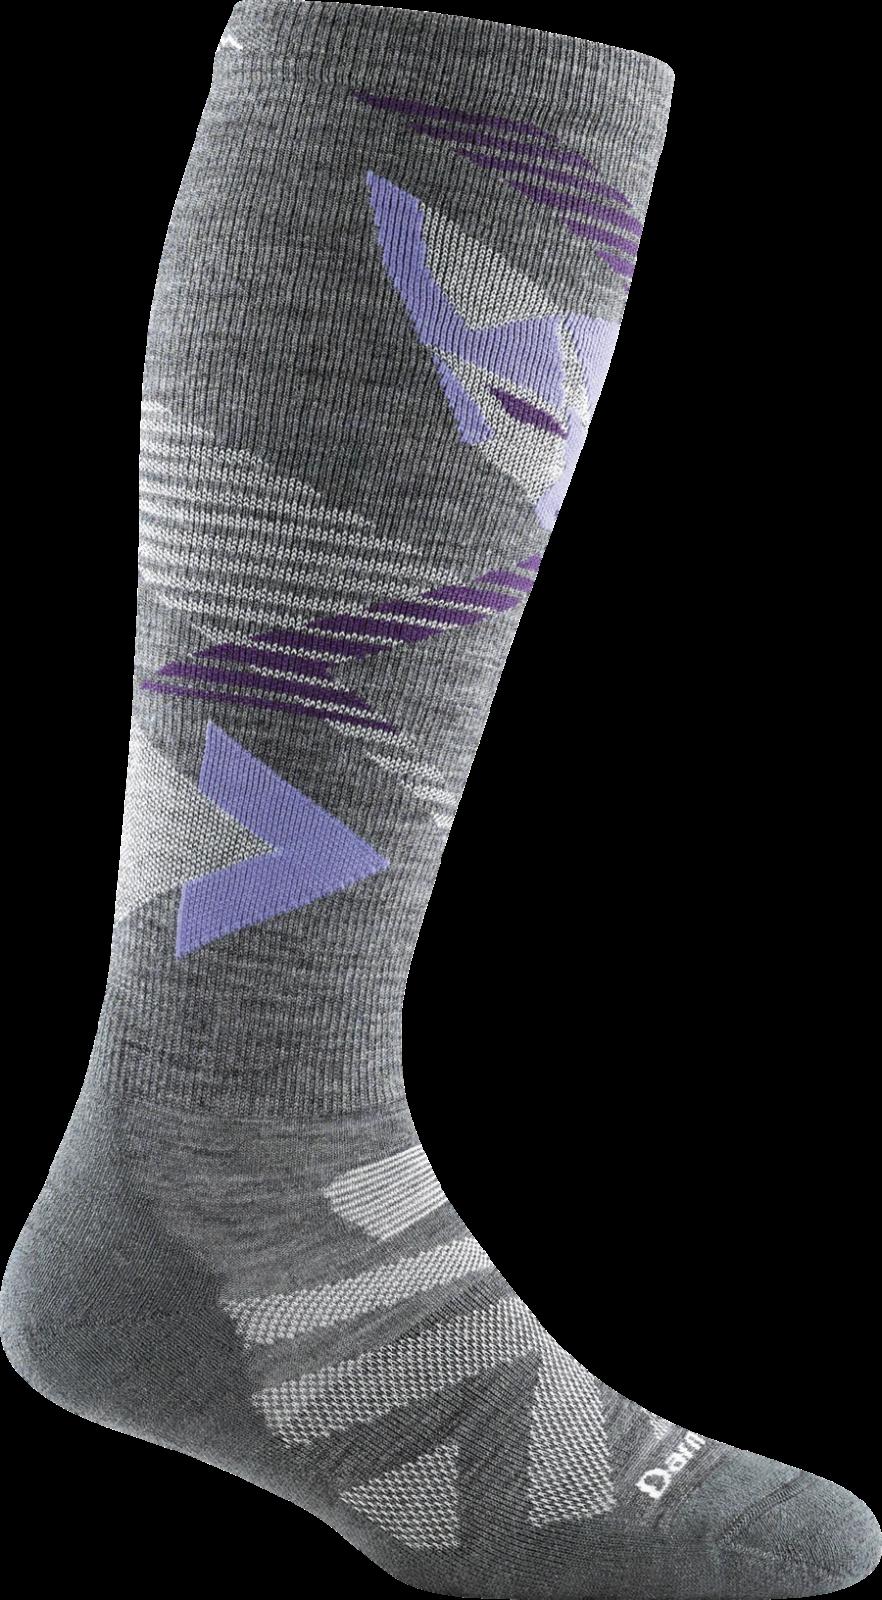 Darn Tough Juniper W OTC Cushion Midweight Socks